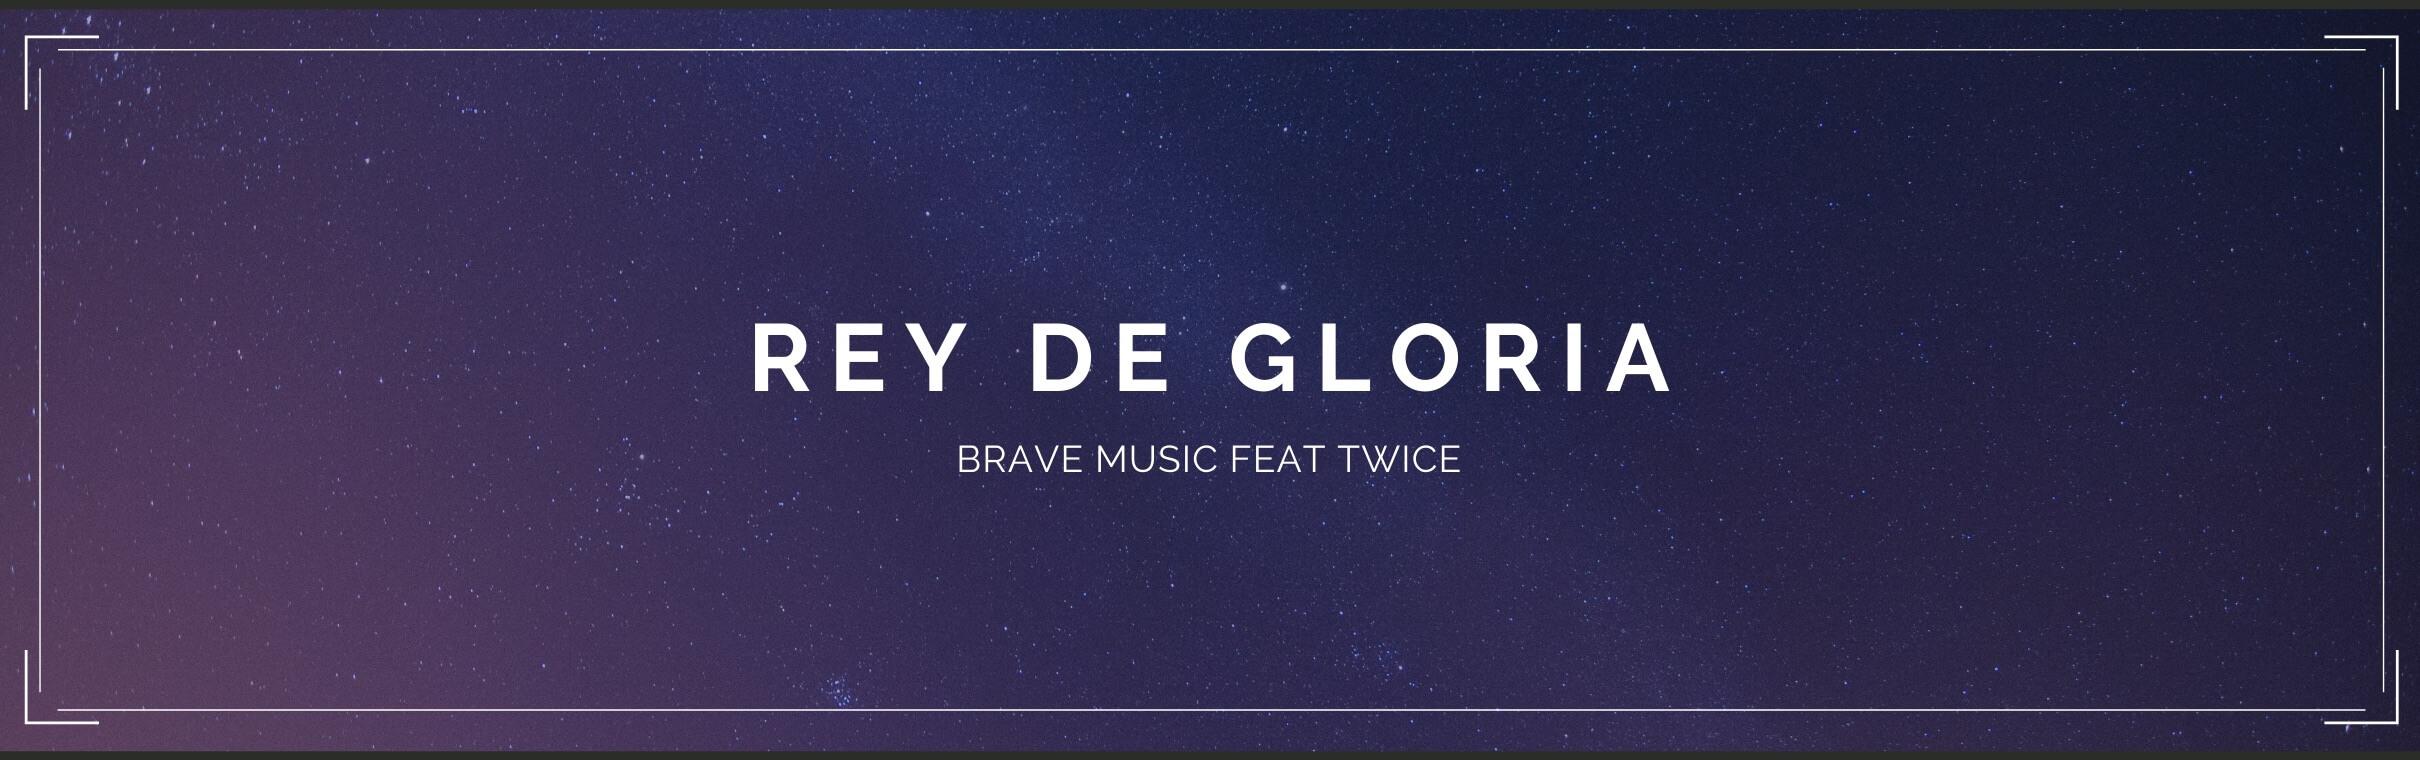 Brave Music